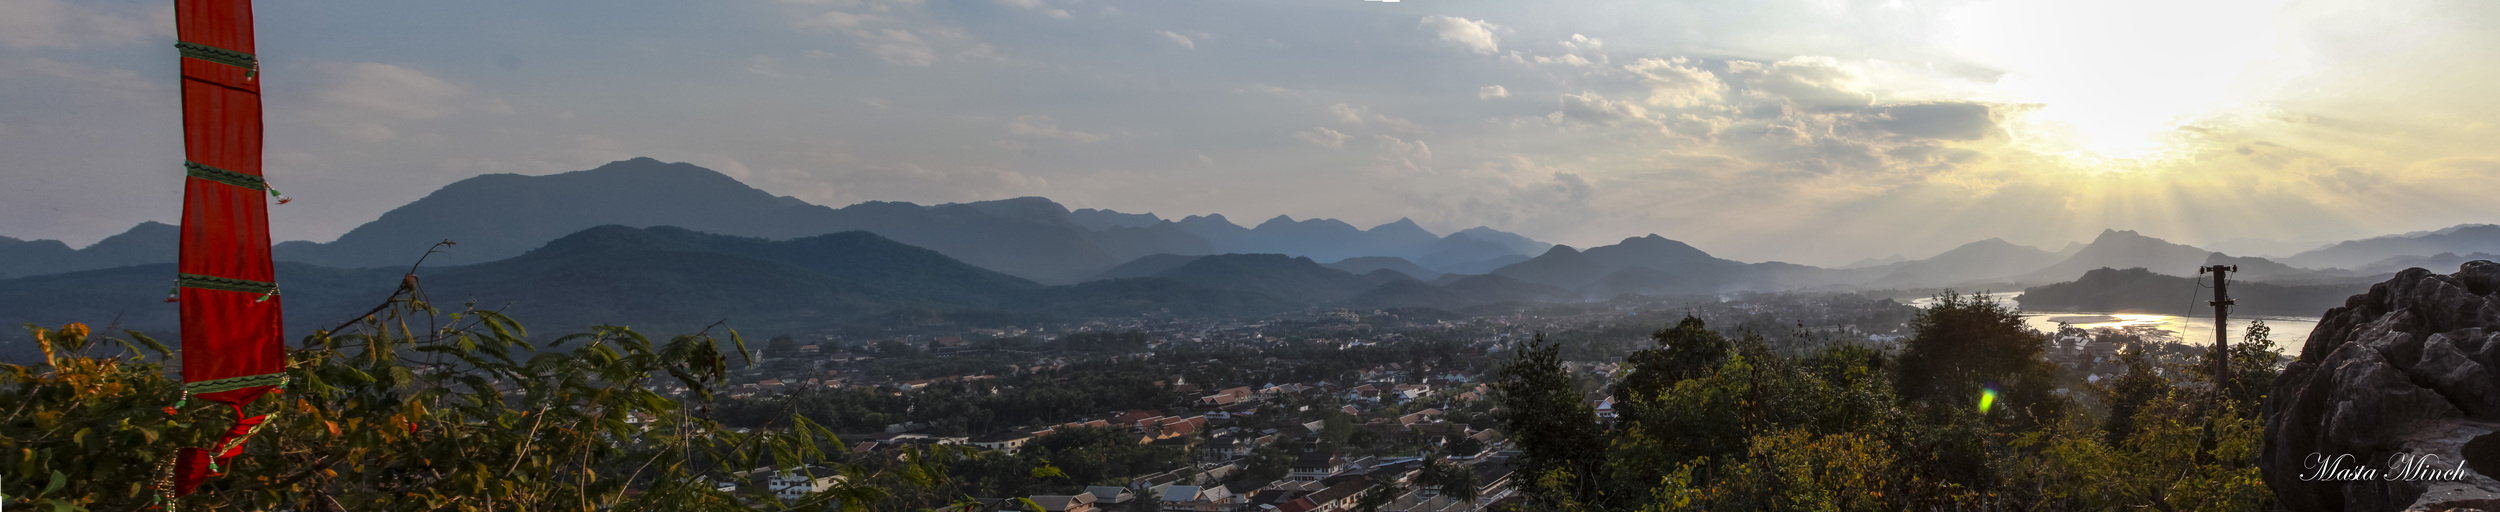 A pano overlooking Luang Prabang as the sun sets